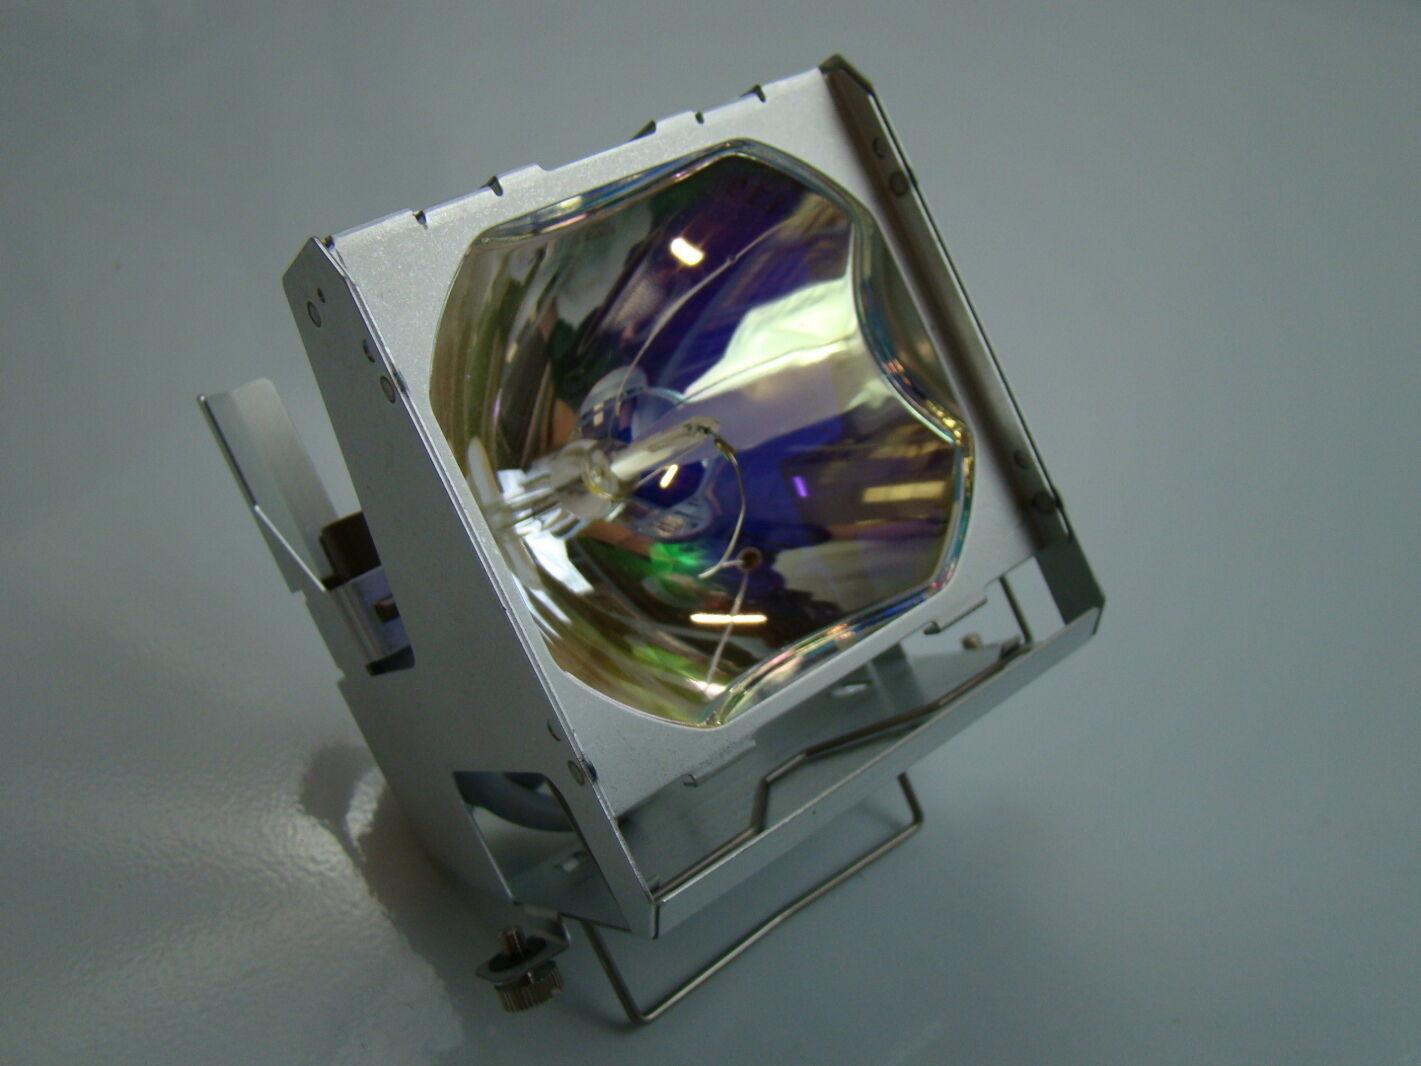 Details about Epson 150 Watt Projector Lamp MSCR150E3H